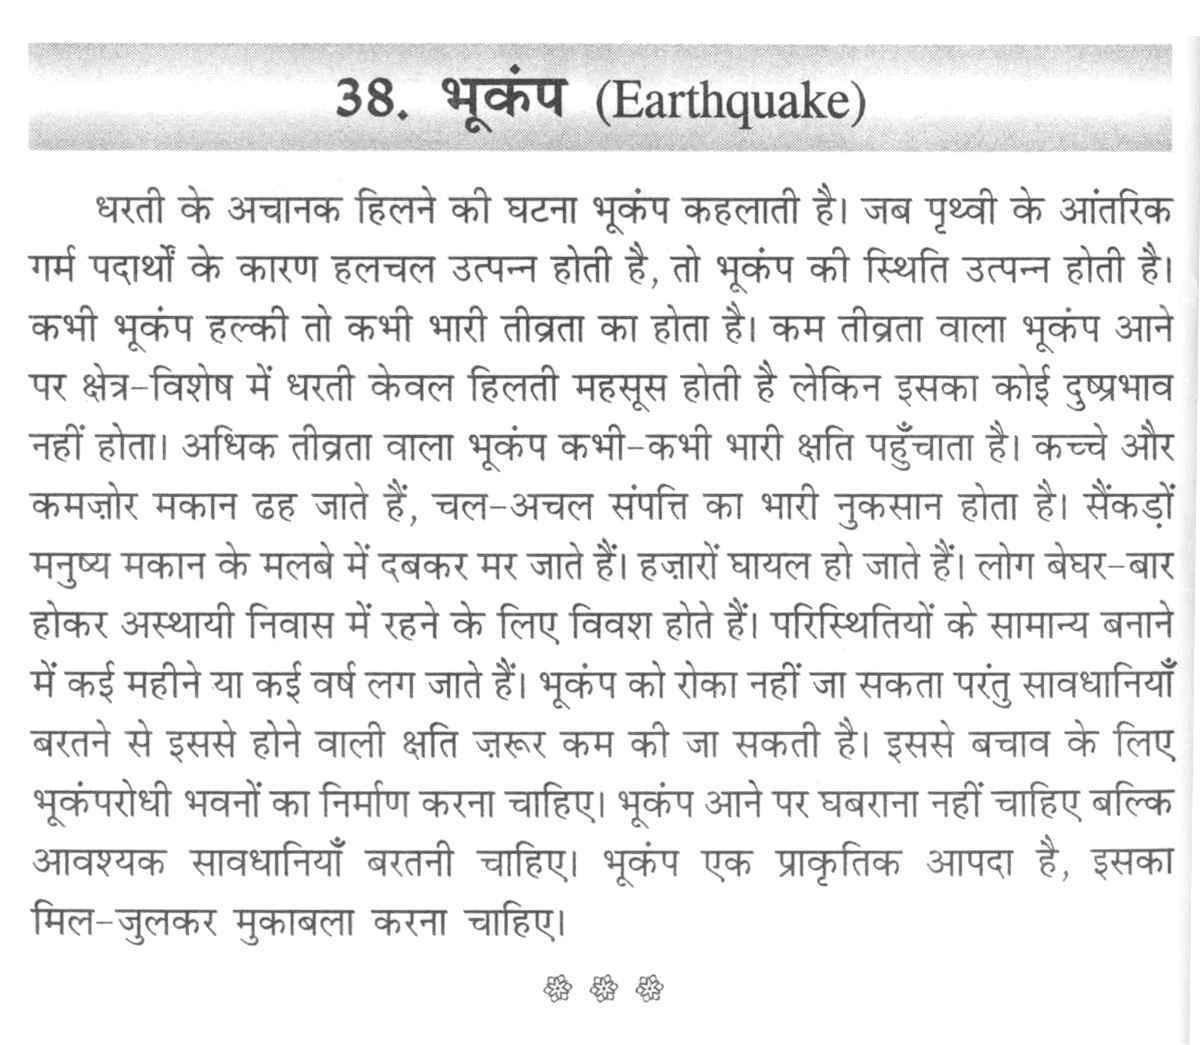 हिंदी निबंध संग्रह Hindi nibandh sangrah 4